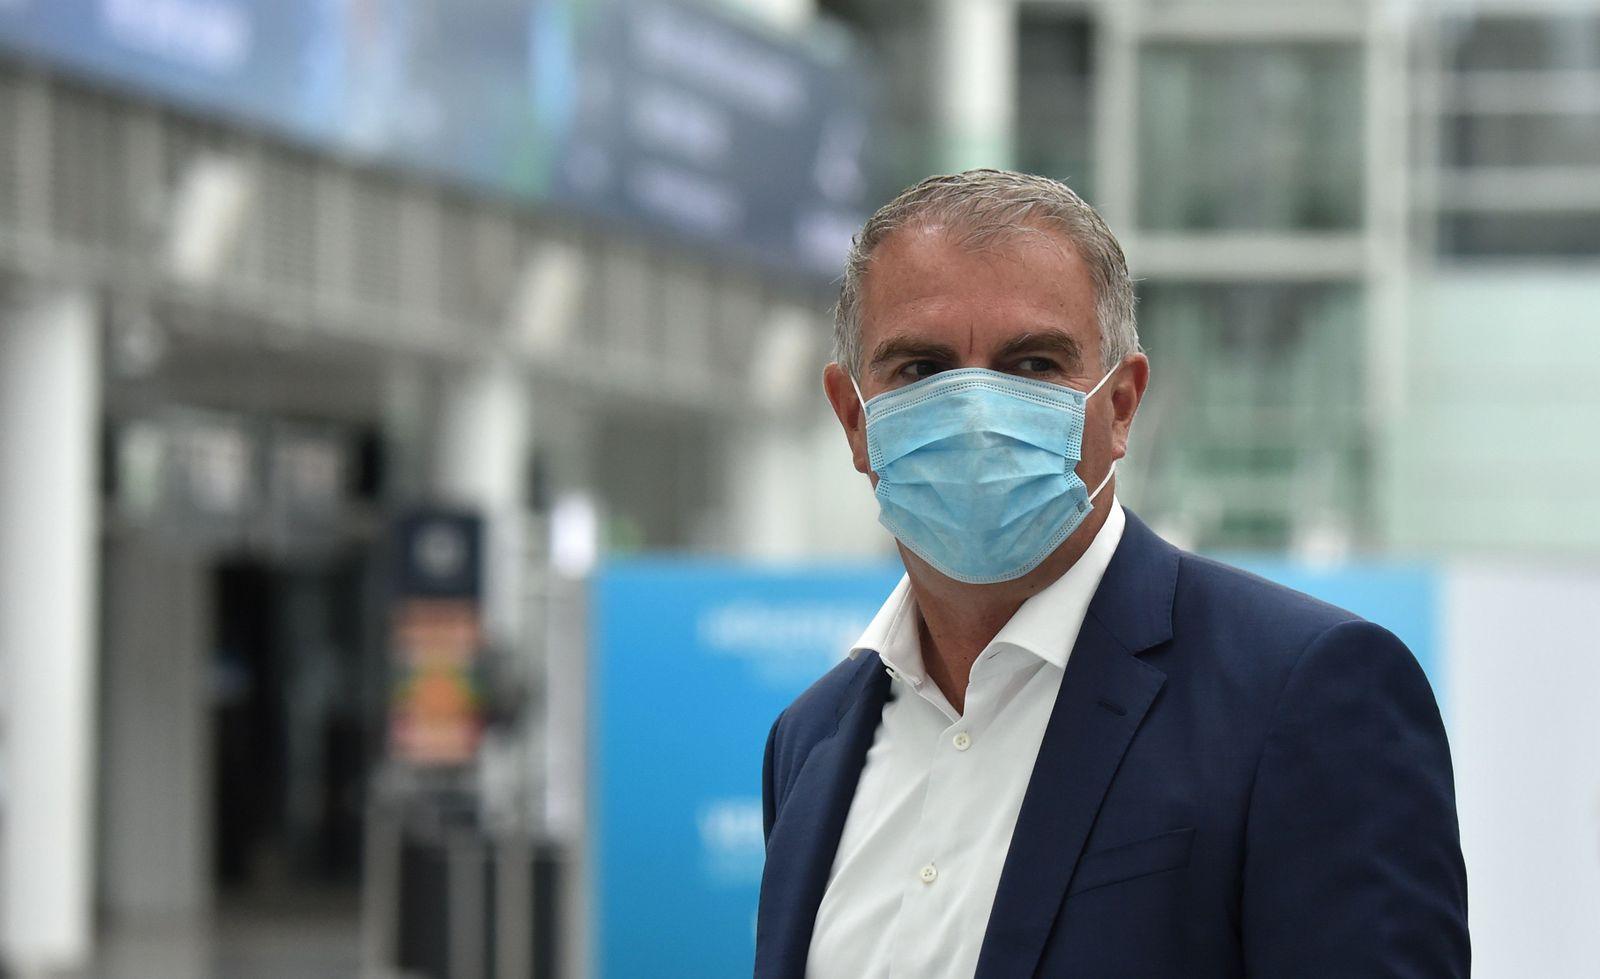 GERMANY-HEALTH-VIRUS-TRANSPORT